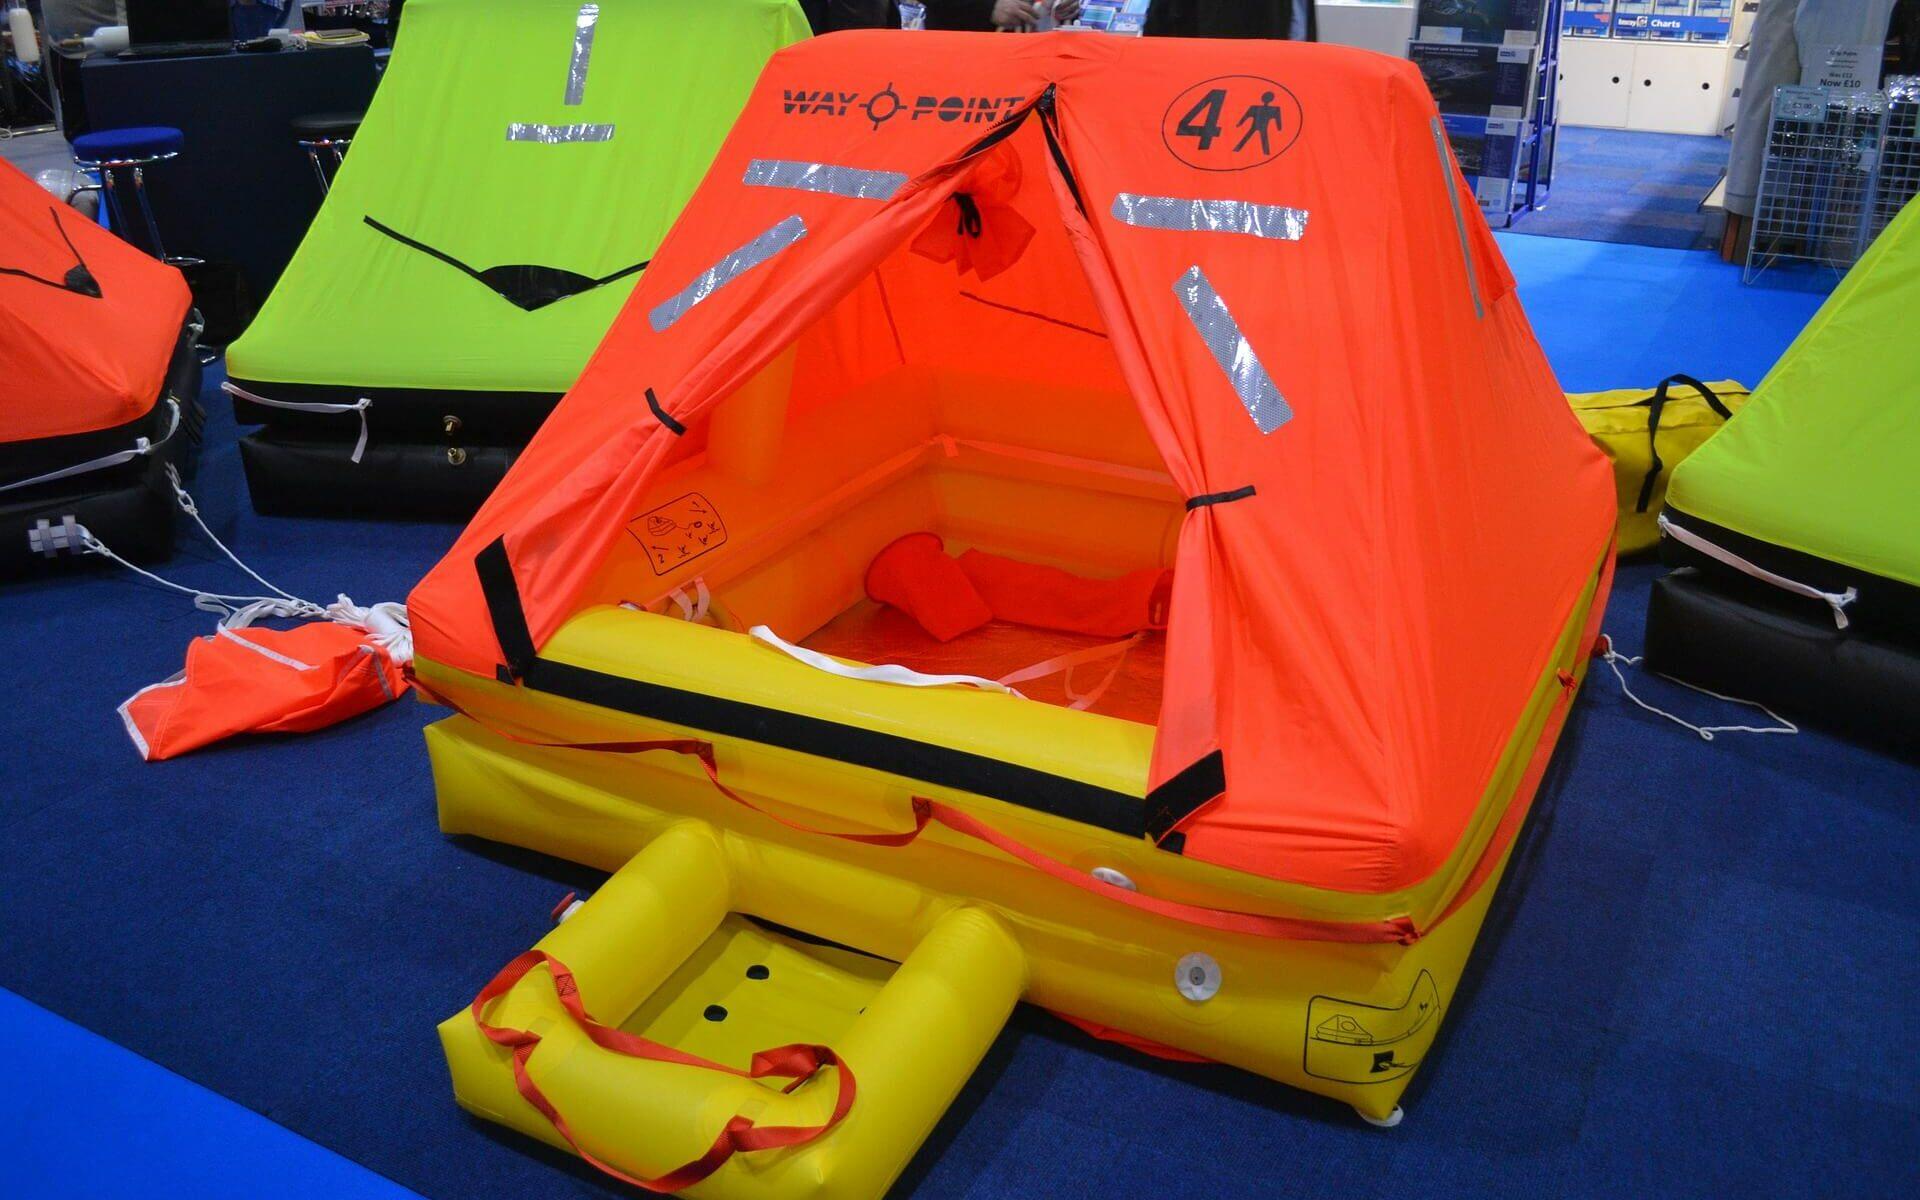 Orange and yellow emergency life raft used for sailing around the world